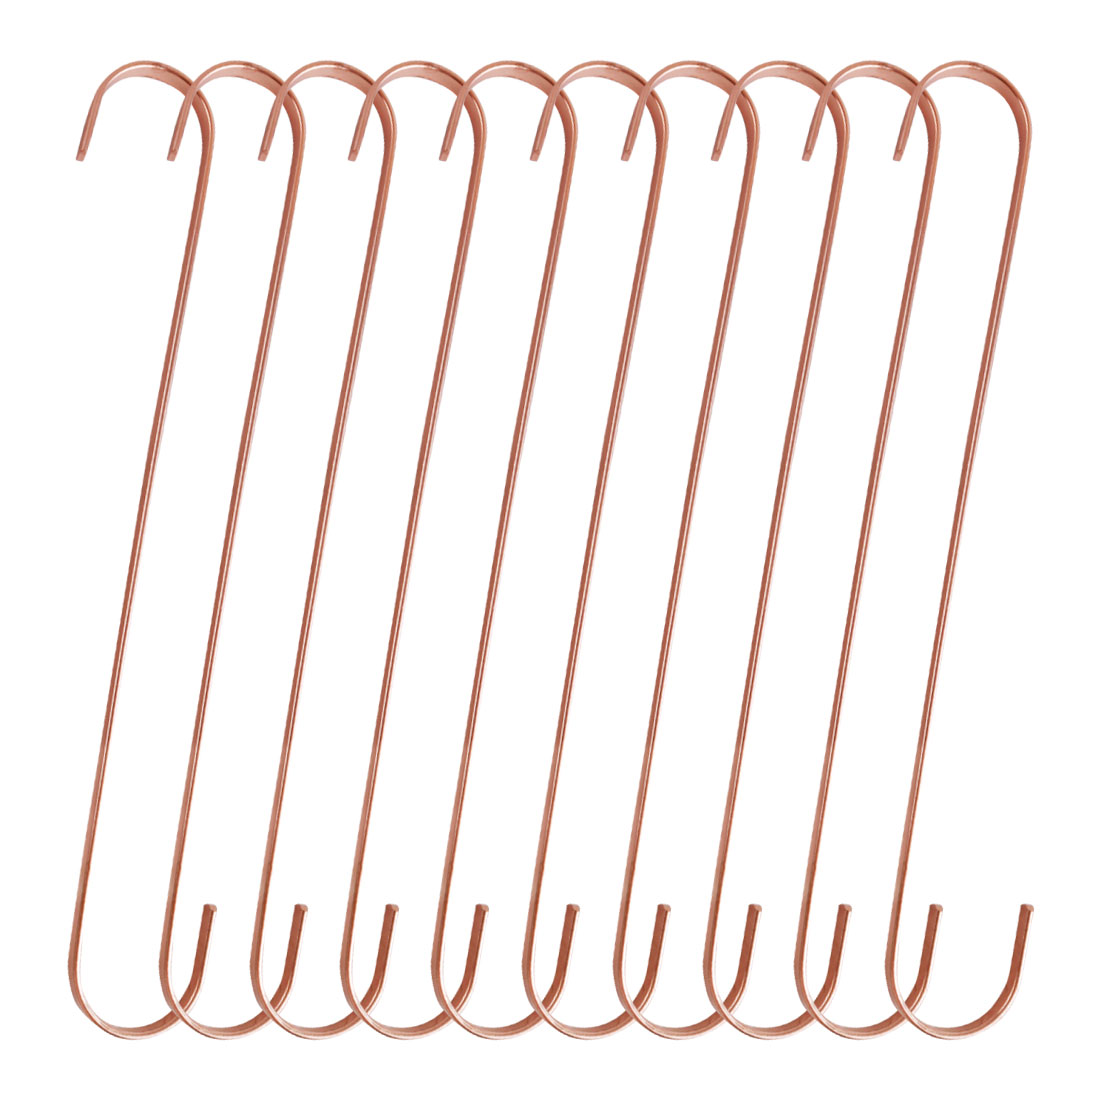 10pcs S Shaped Hook Stainless Steel for Kitchenware Pot Utensil Holder Rose Gold